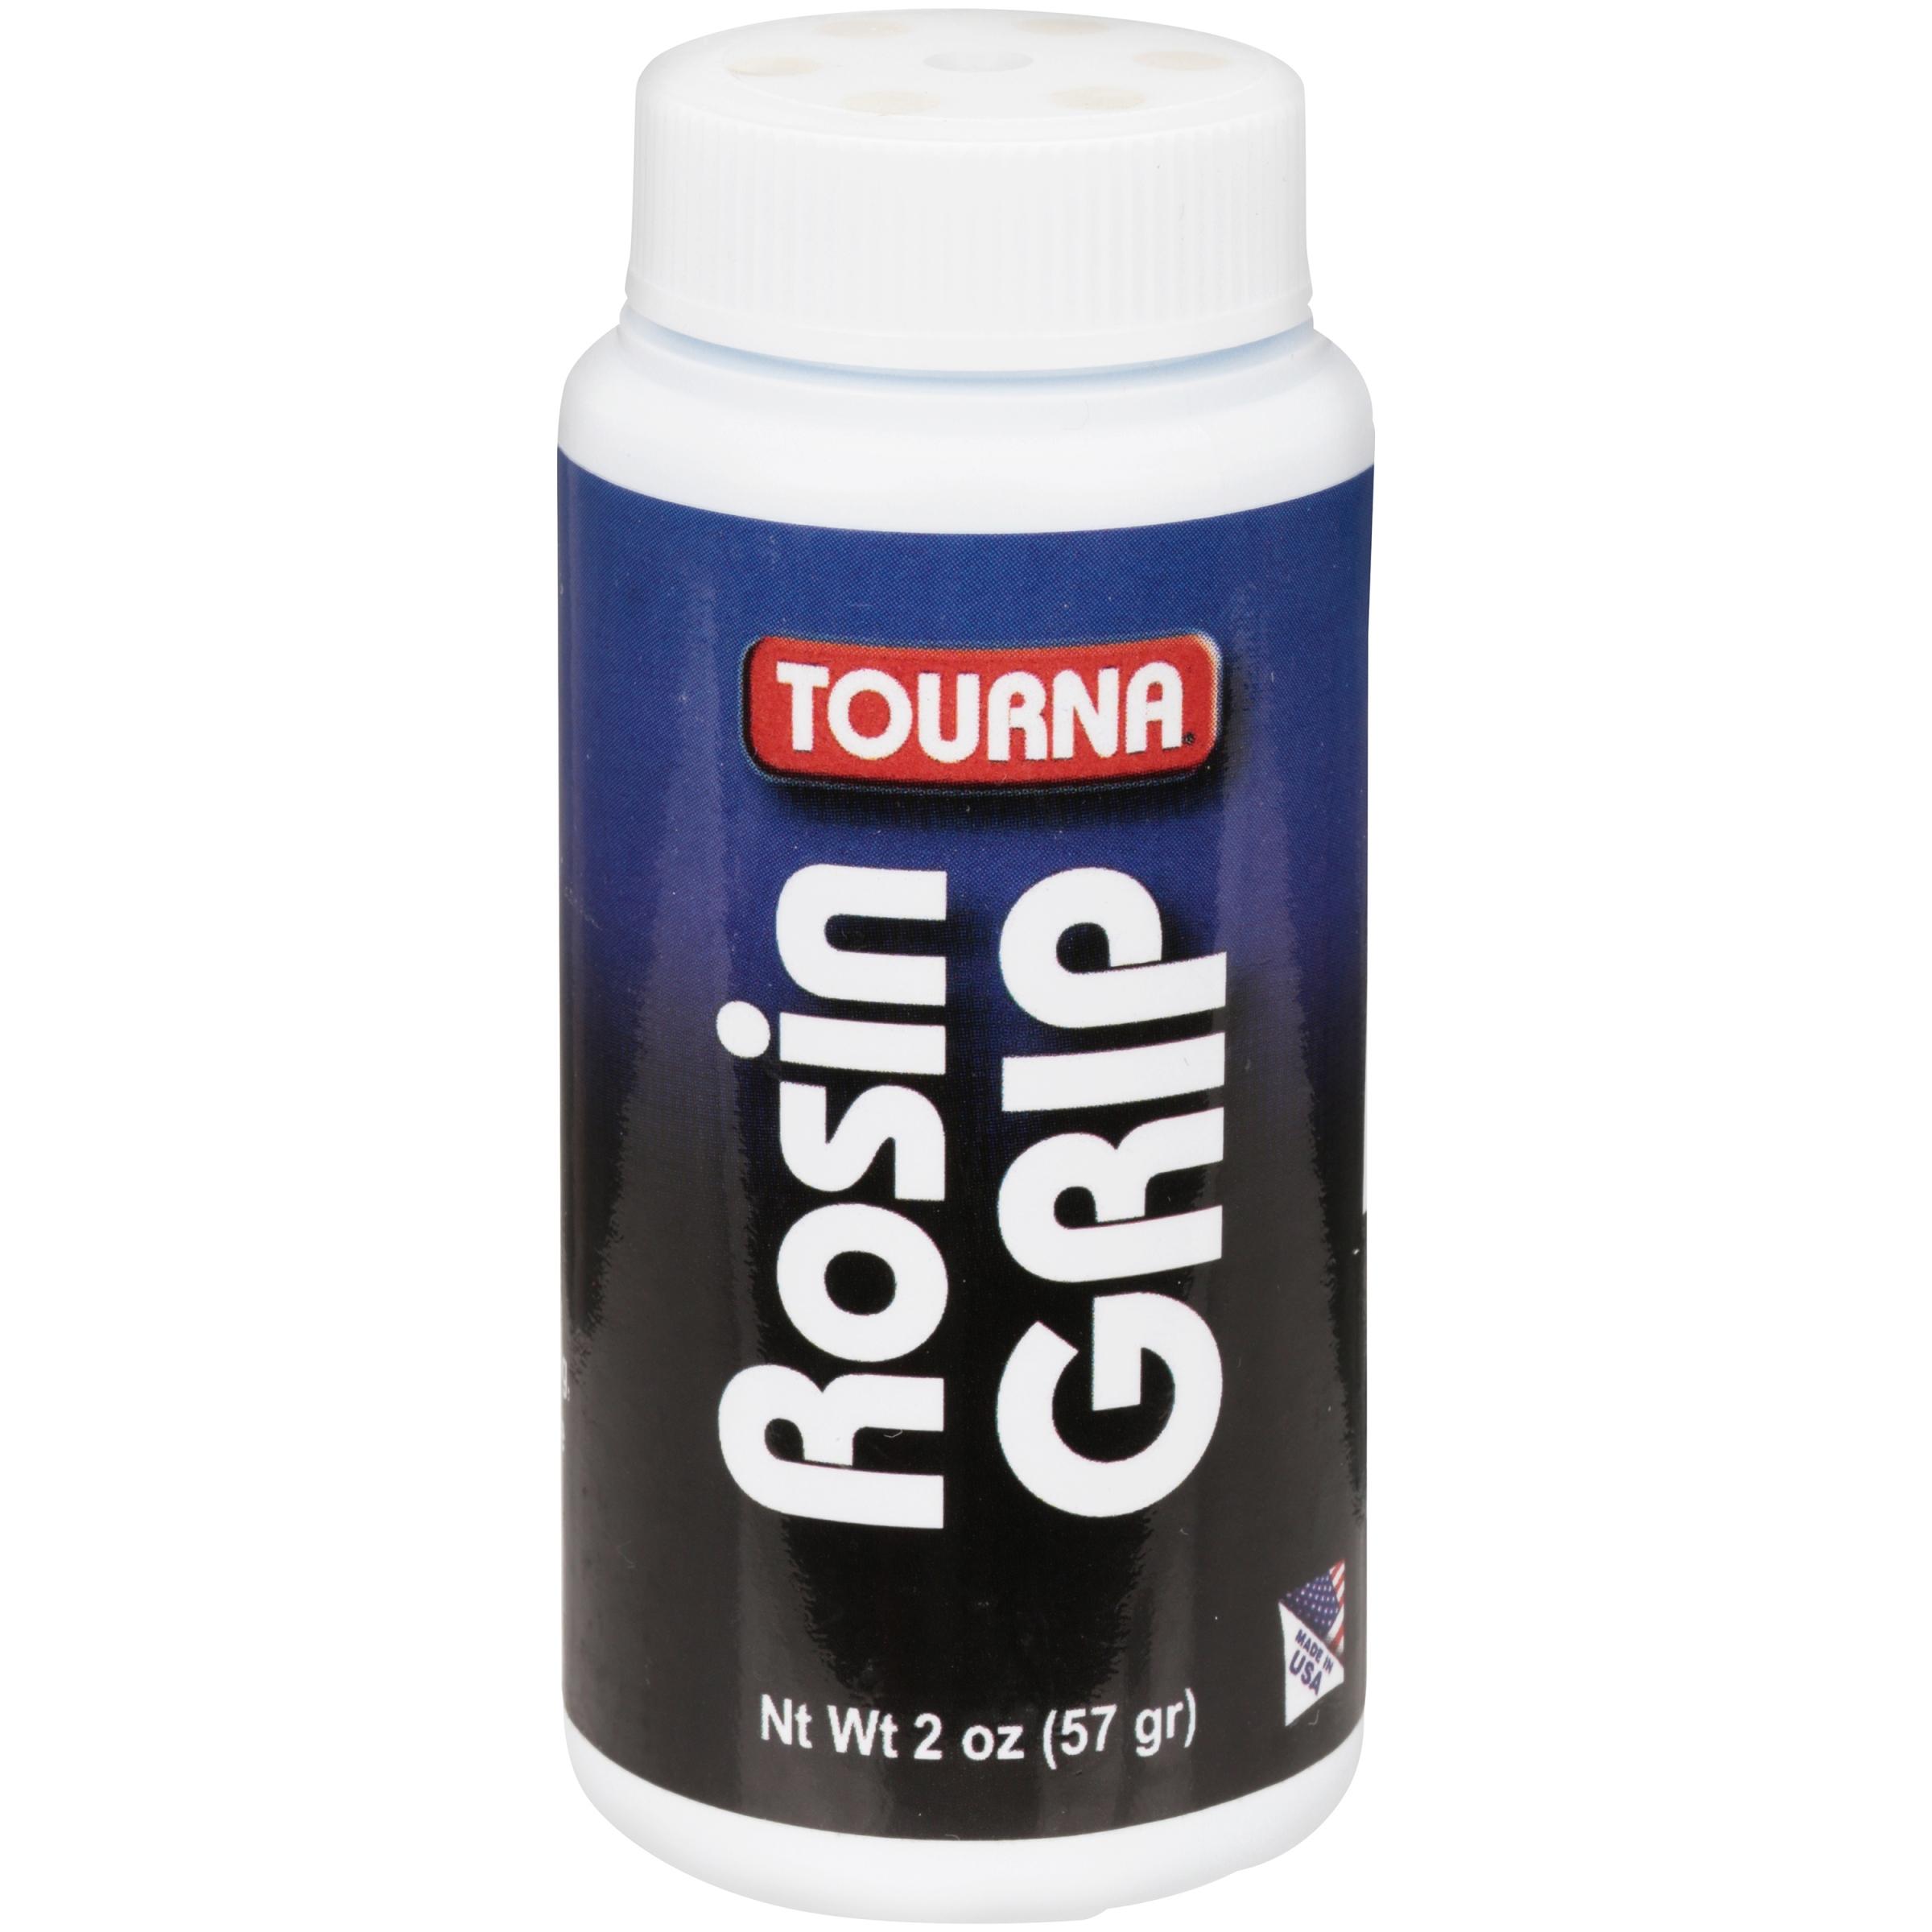 Tourna® Rosin Grip Powder 2 oz. Shaker